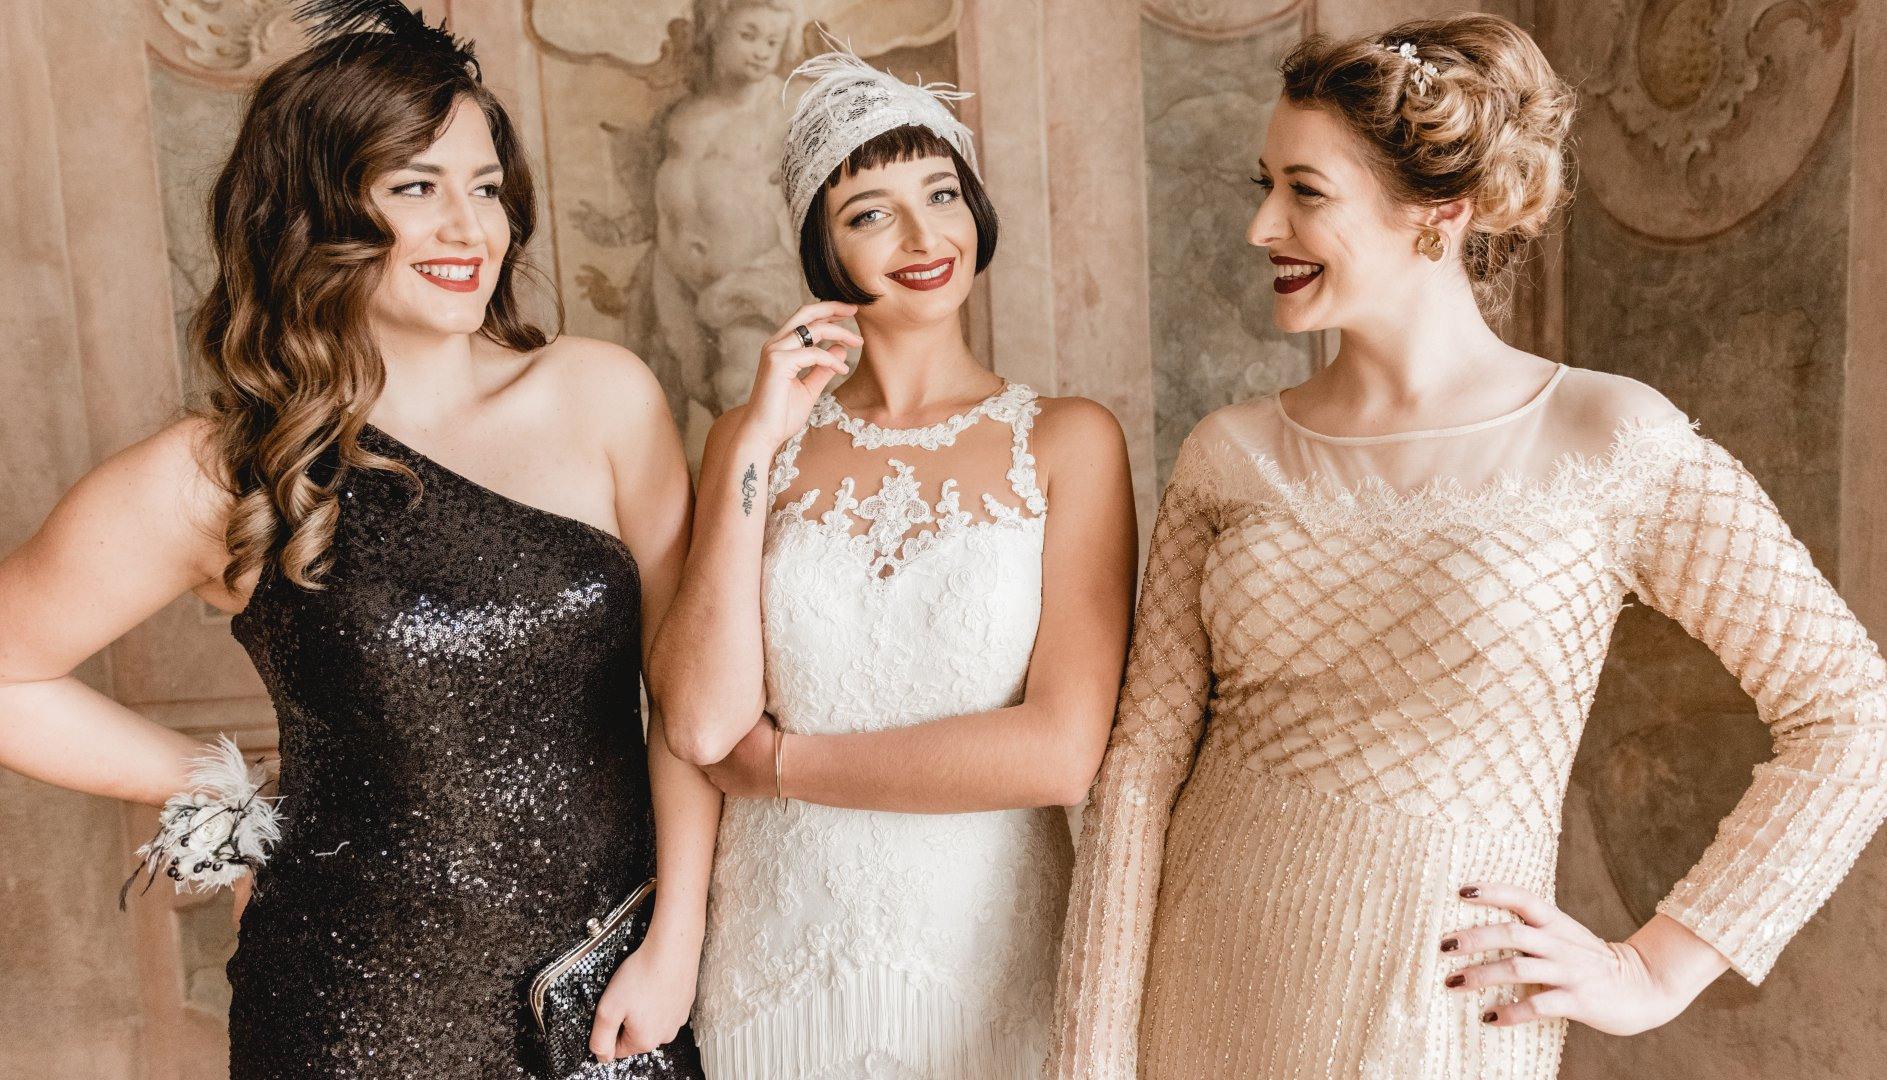 12 Spektakulär Abendkleider Augsburg Stylish - Abendkleid